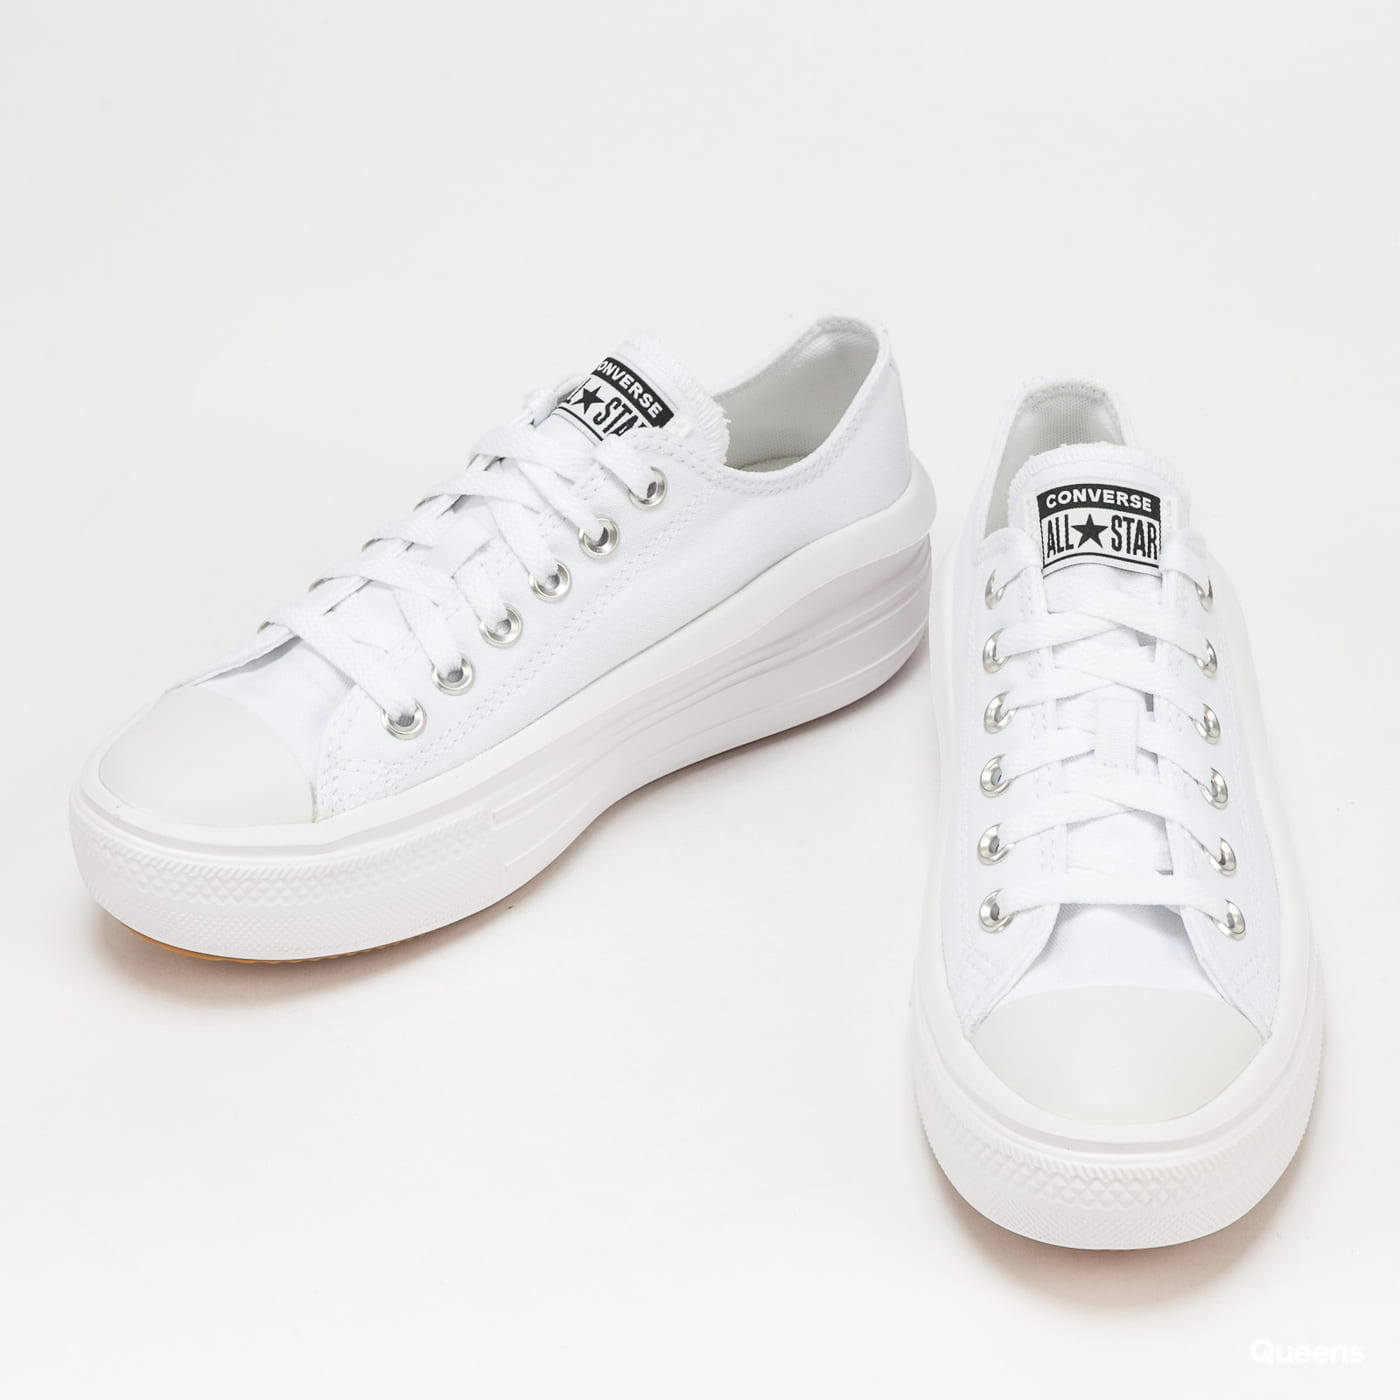 Converse Chuck Taylor All Star Move OX white / white / white